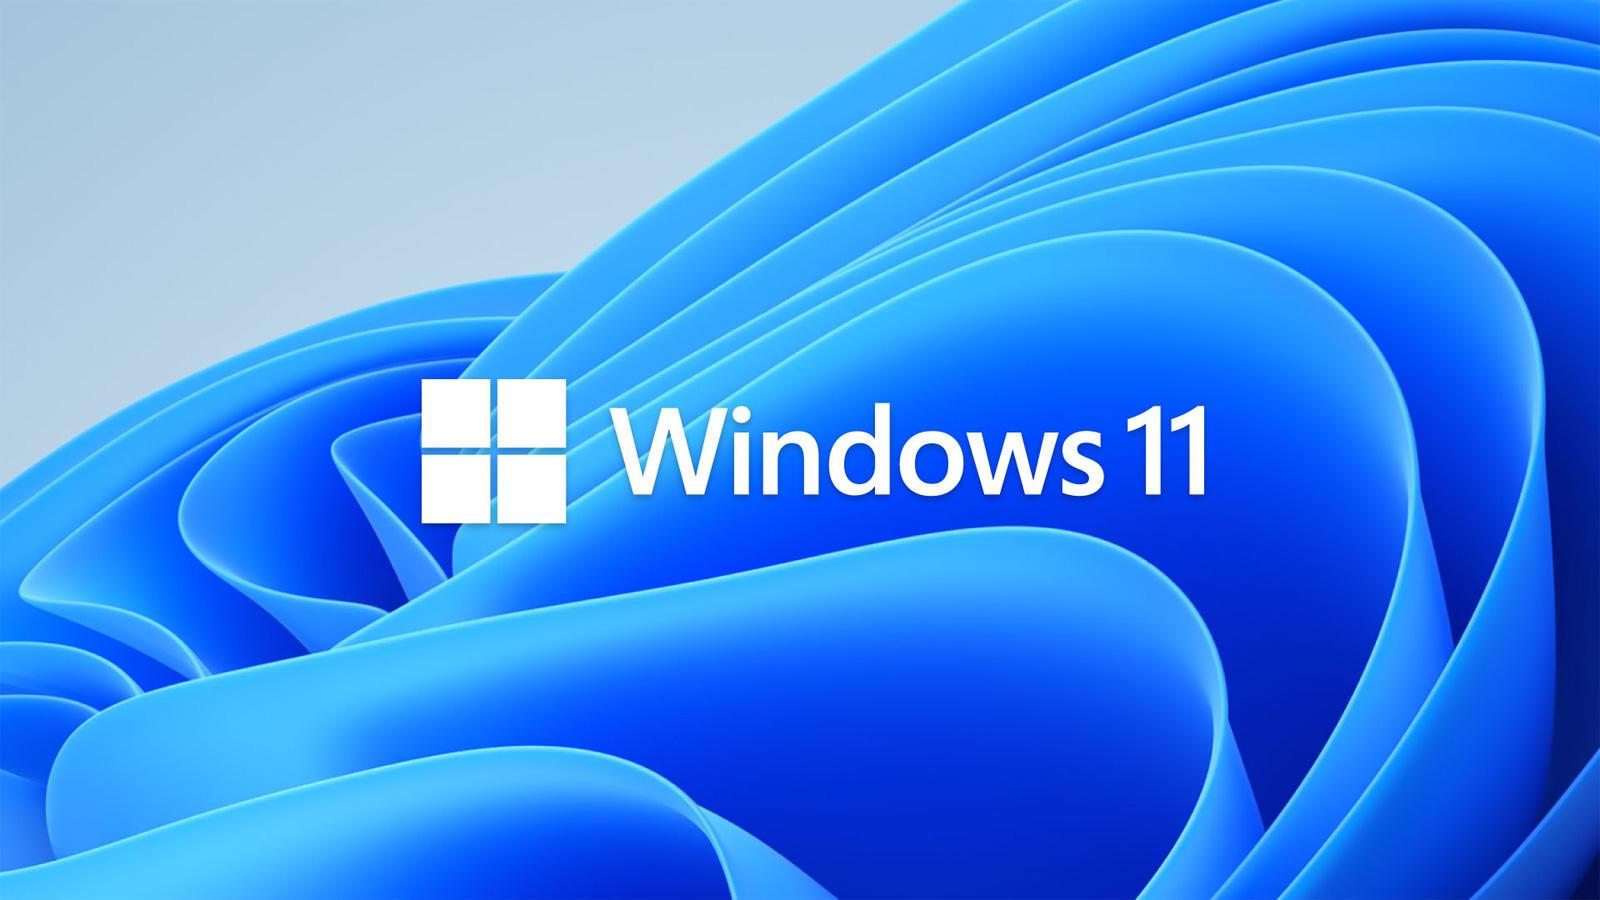 New Windows 11 Dev build released with Microsoft 365 Widget